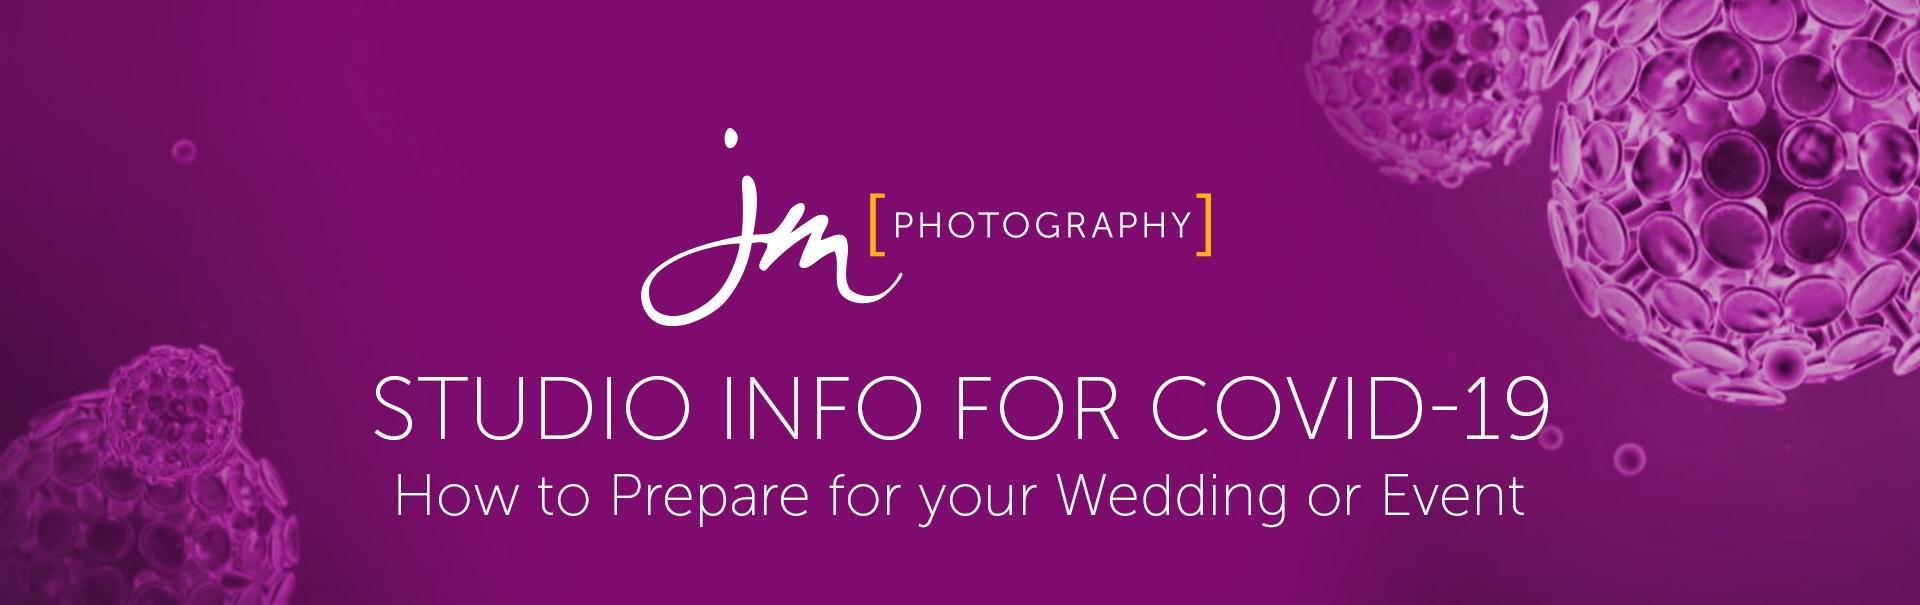 covid-19-coronavirus-wedding-event-preperation-jm_photography-200801